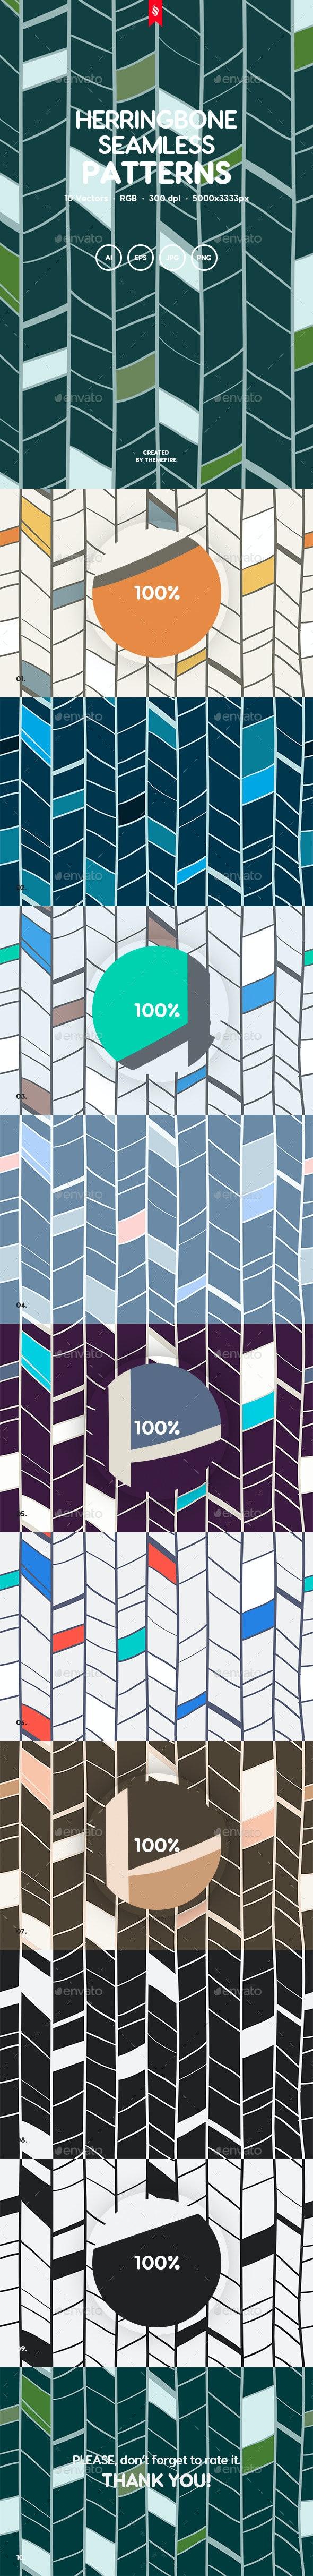 Herringbone Seamless Patterns - Patterns Backgrounds